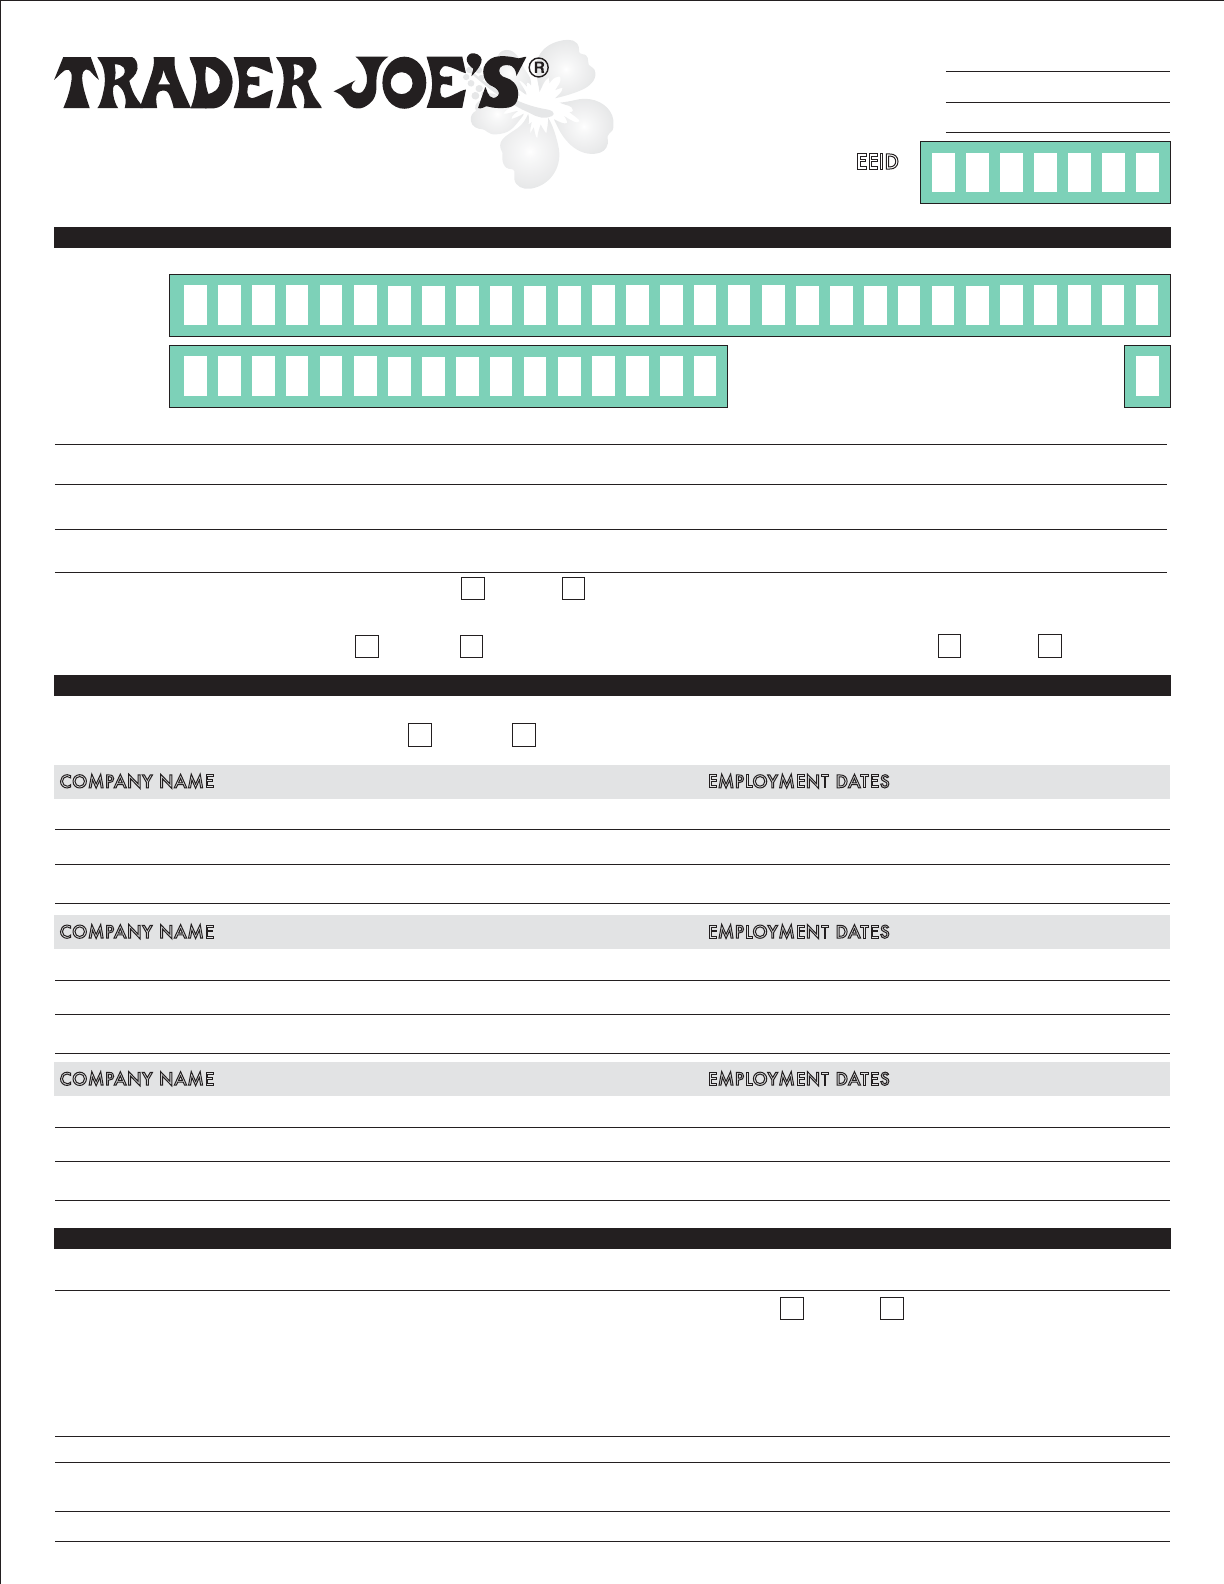 Free printable trader joes job application form falaconquin